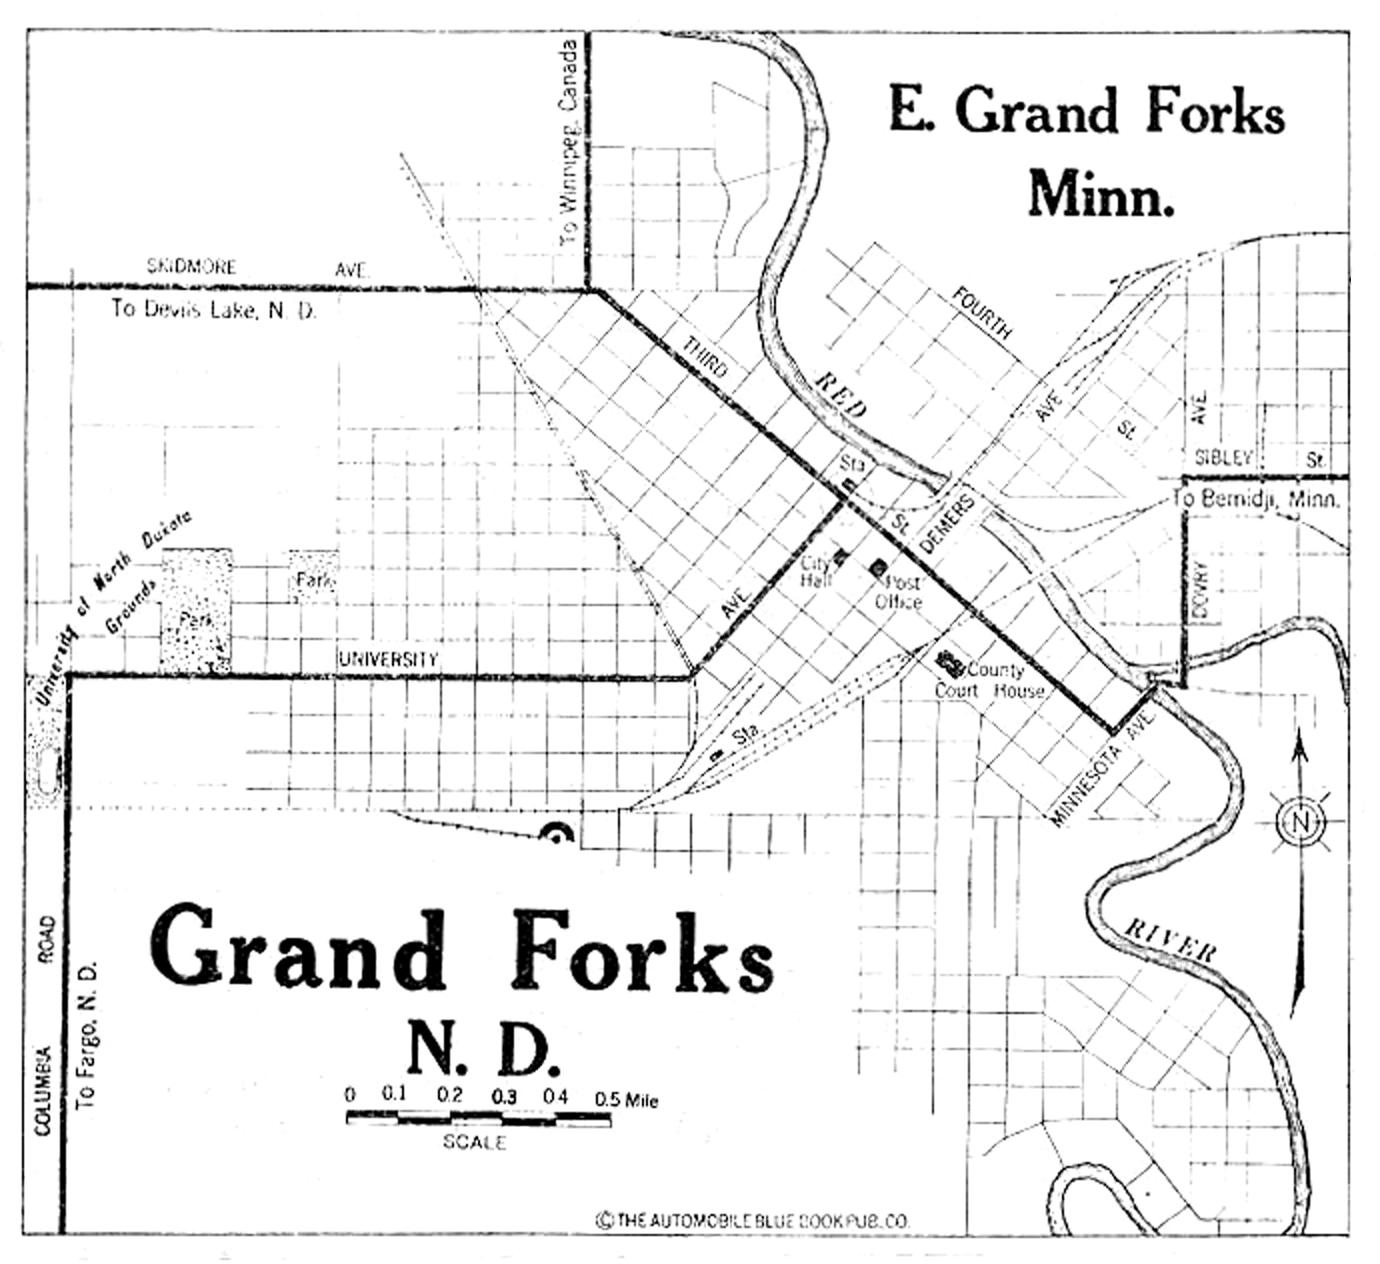 North Dakota City Maps at AmericanRoadscom